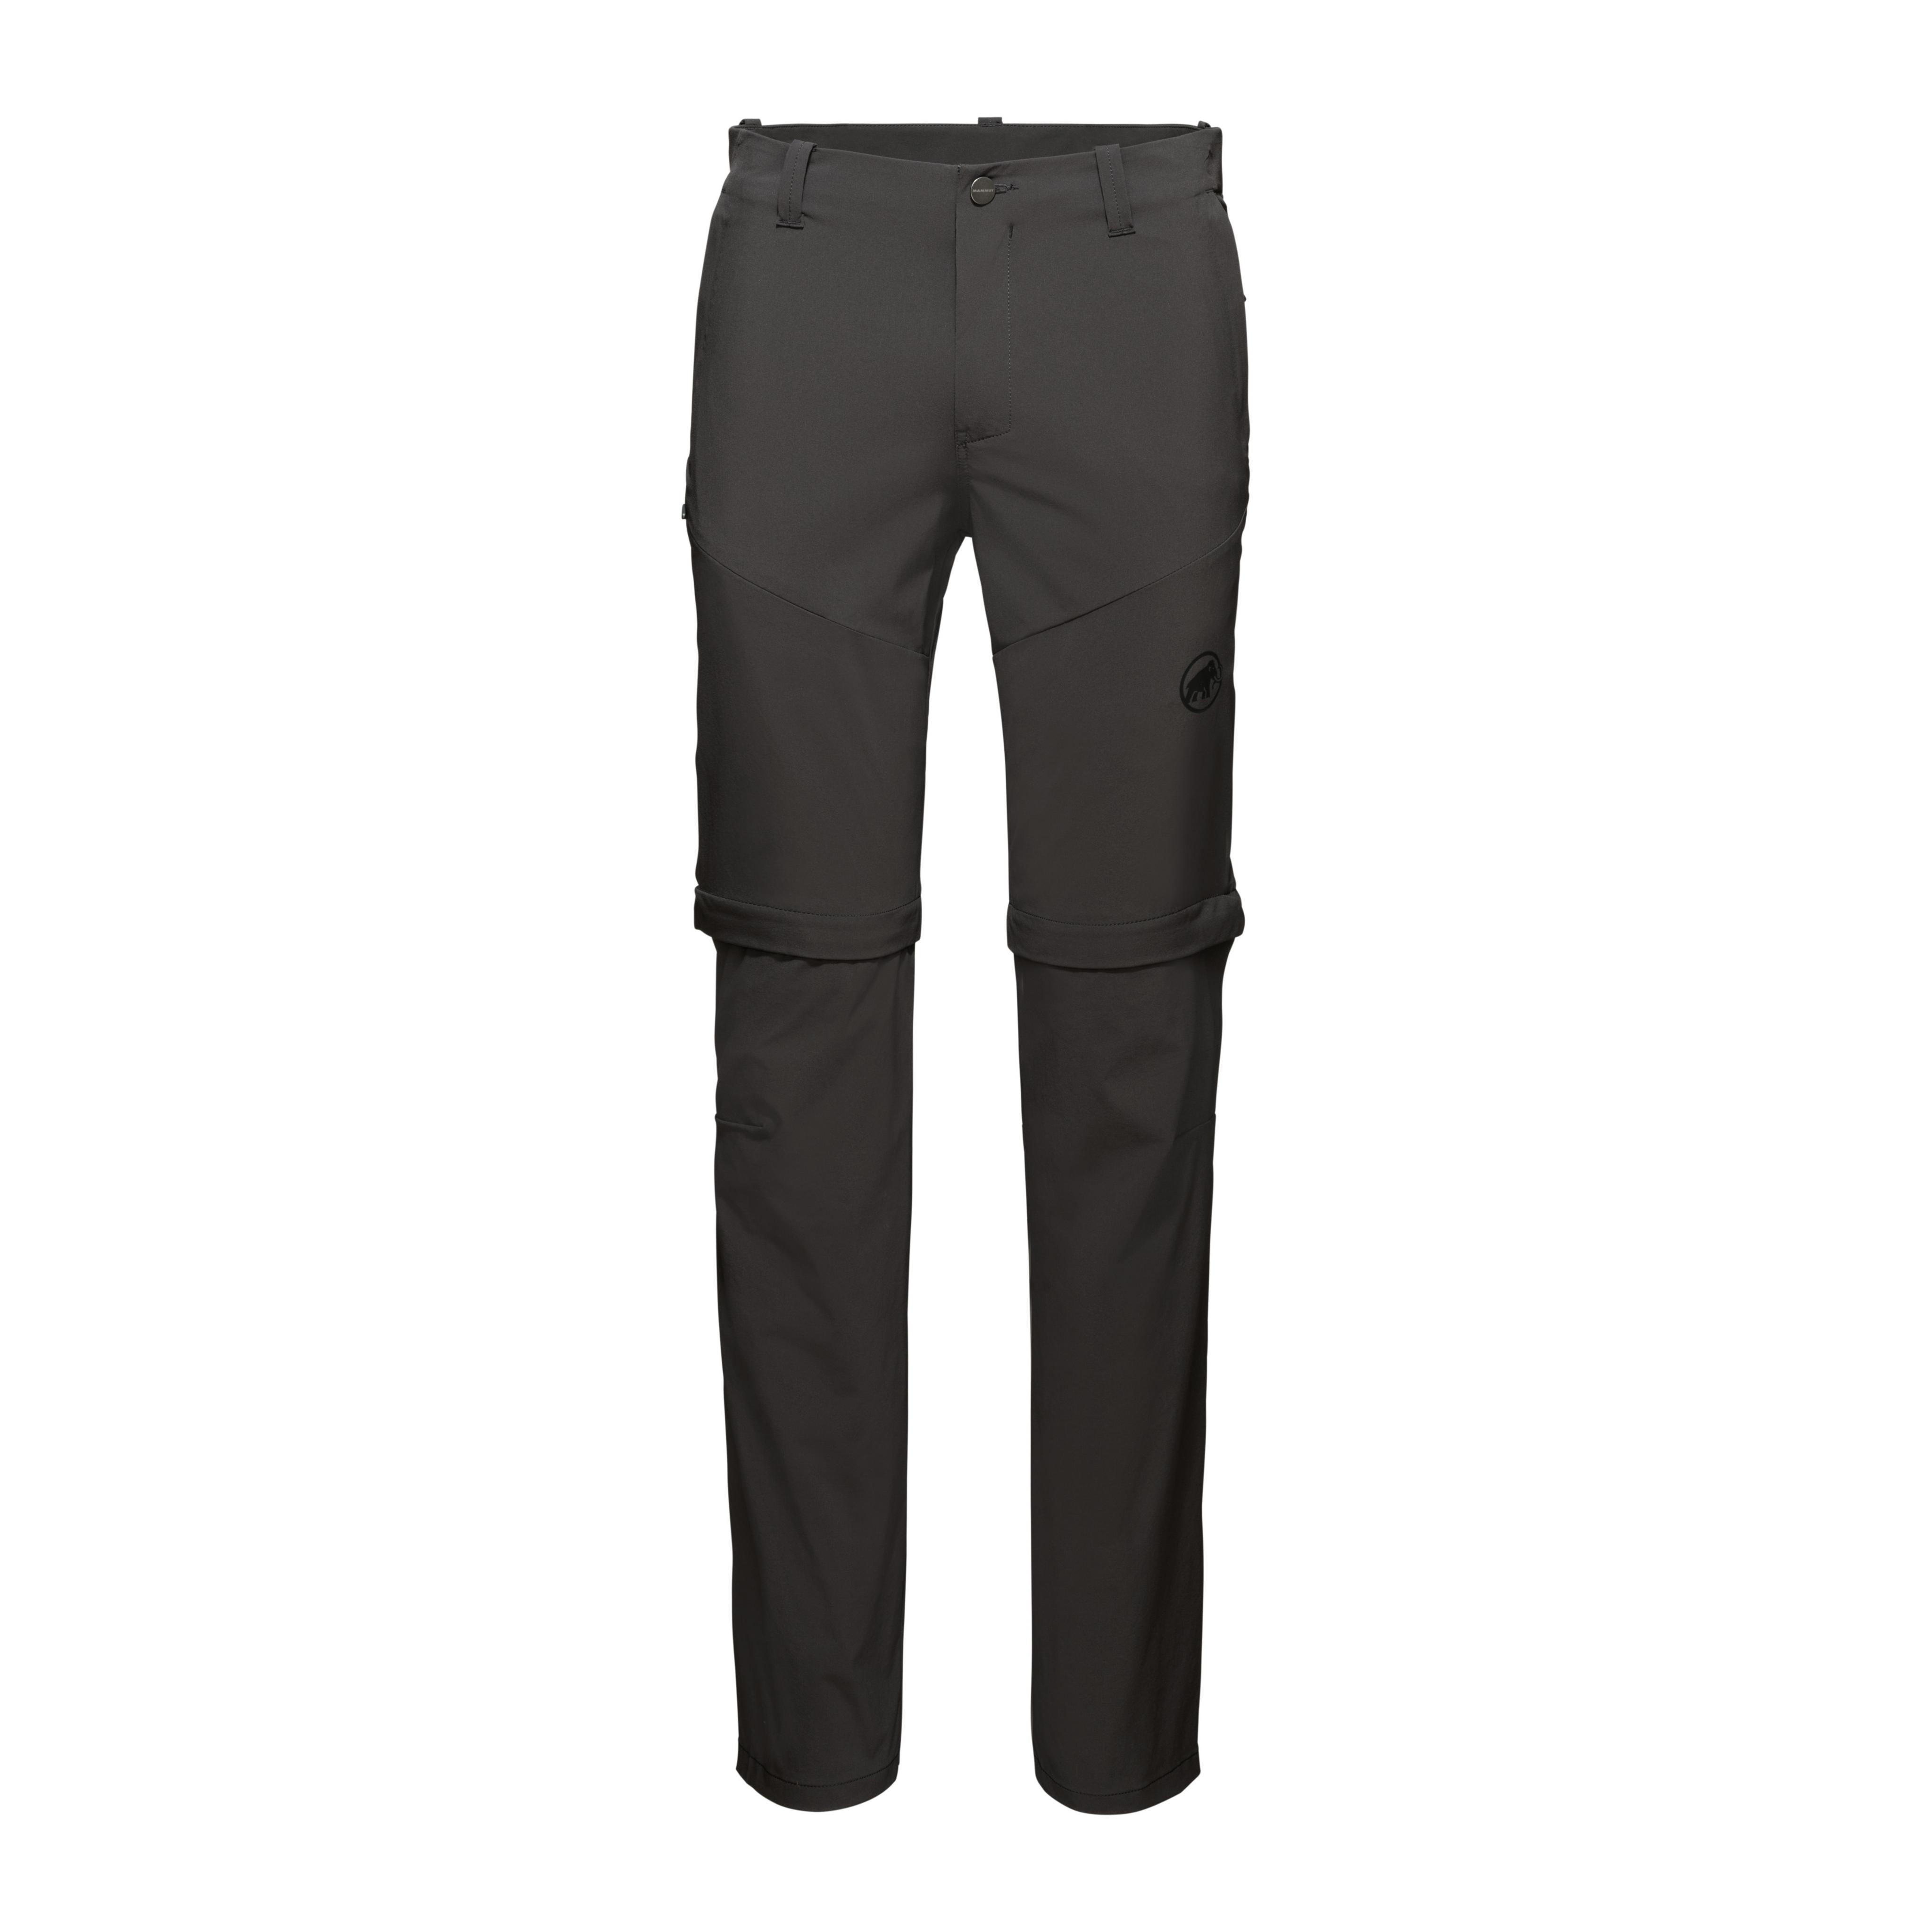 Runbold Zip Off Pants Men - normal, phantom, UK 28 thumbnail